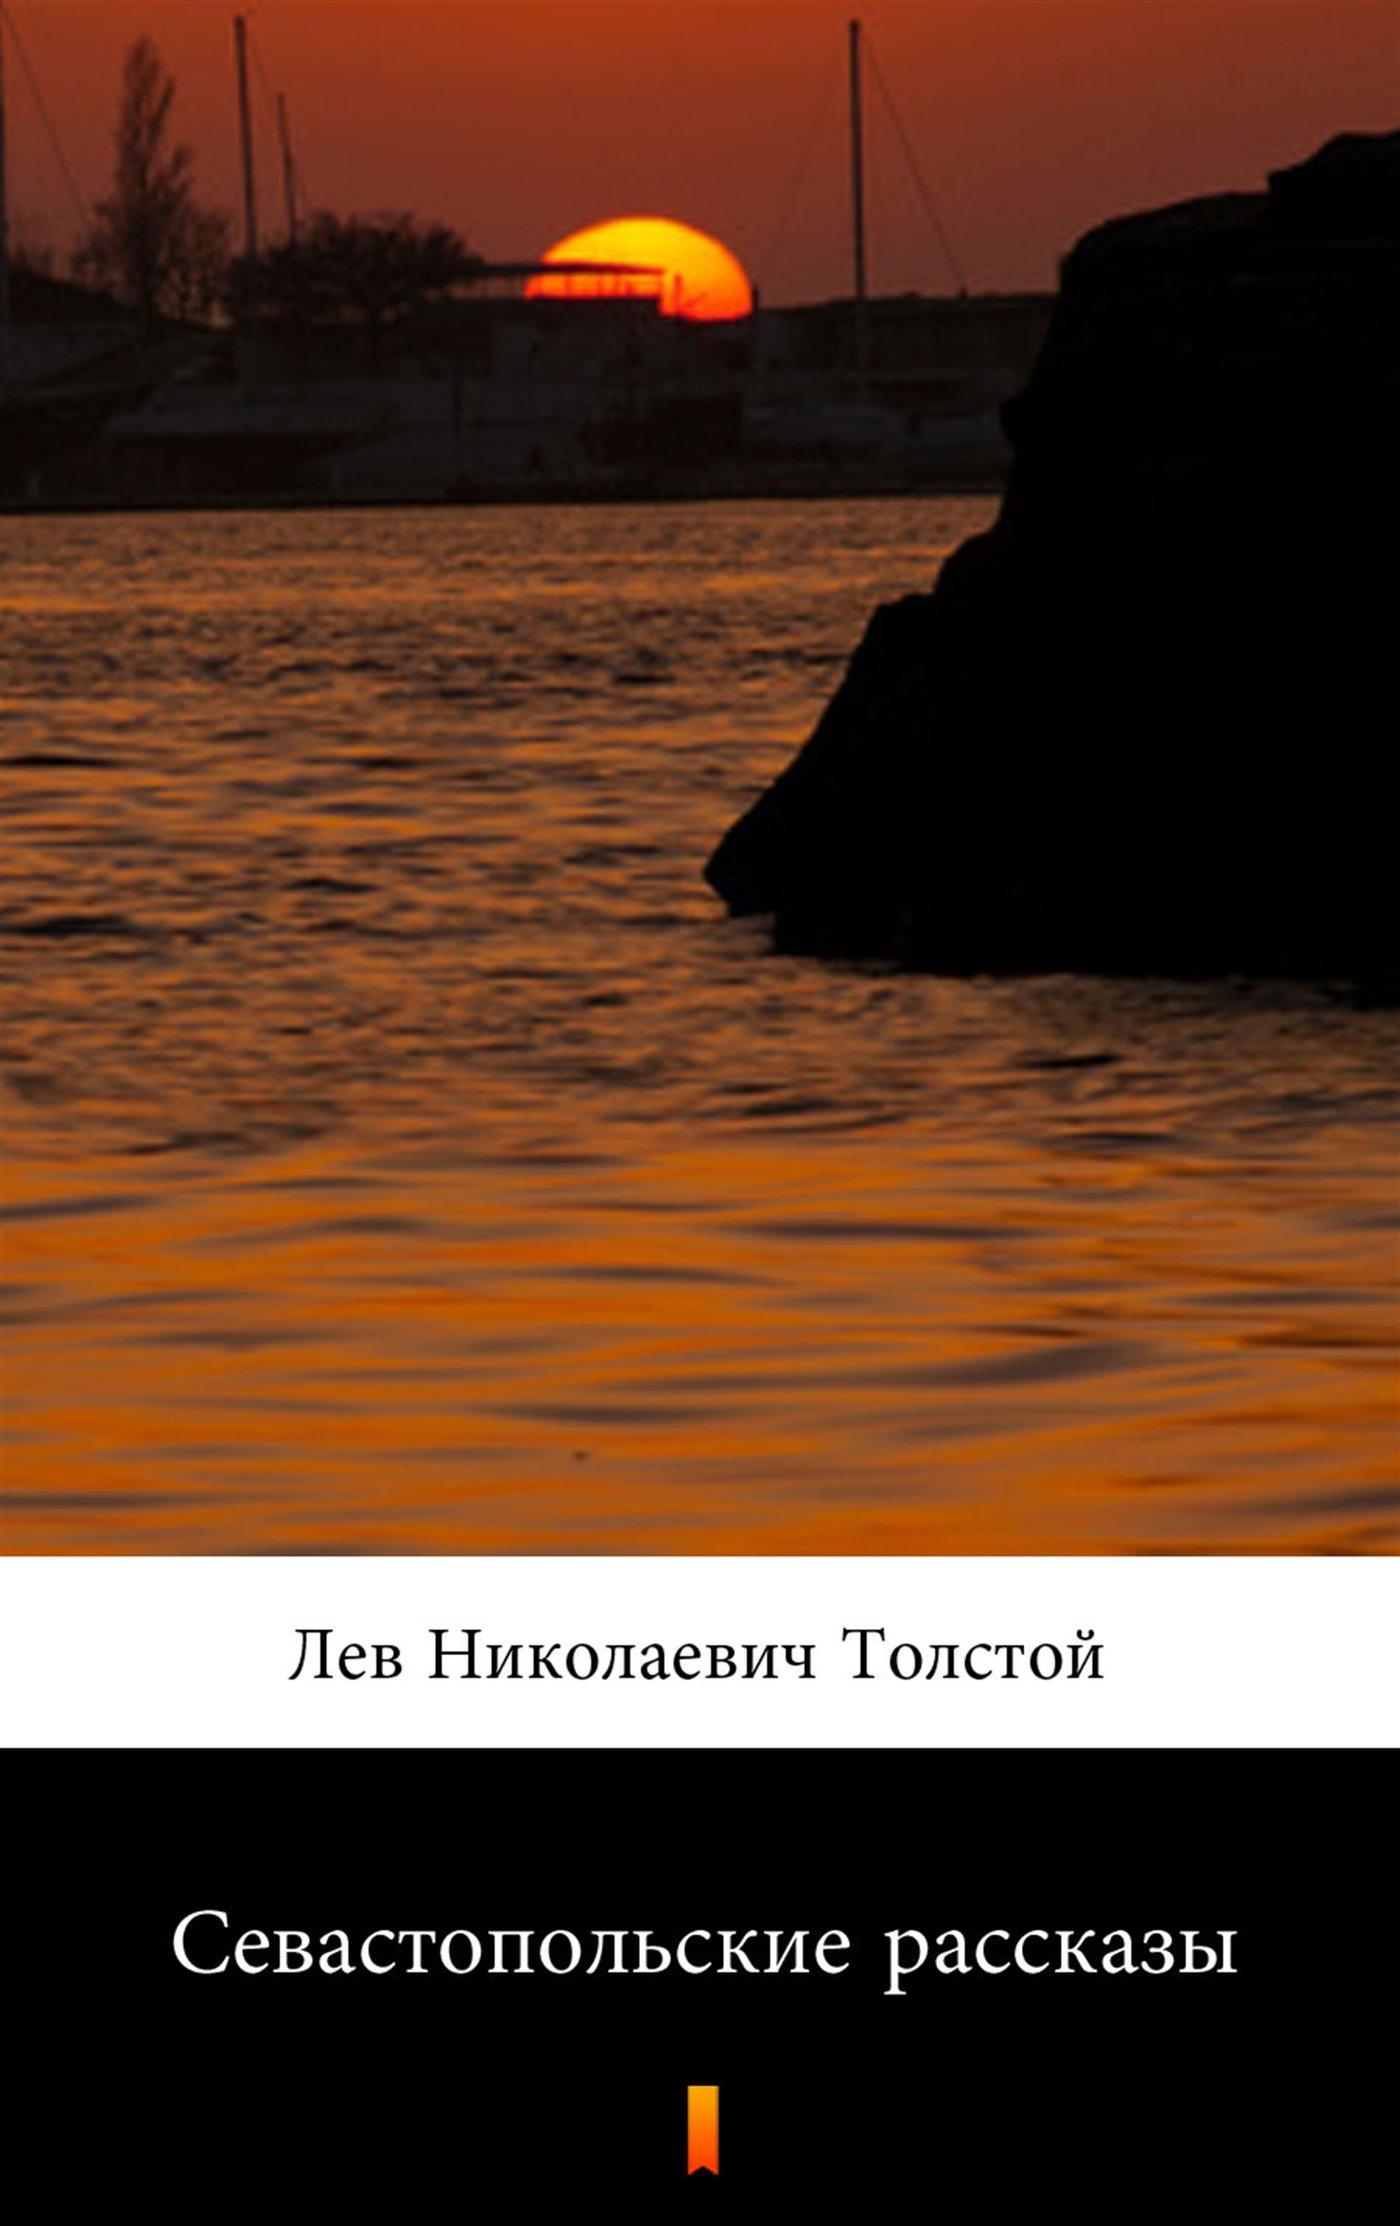 Севастопольские рассказы - Ebook (Książka na Kindle) do pobrania w formacie MOBI